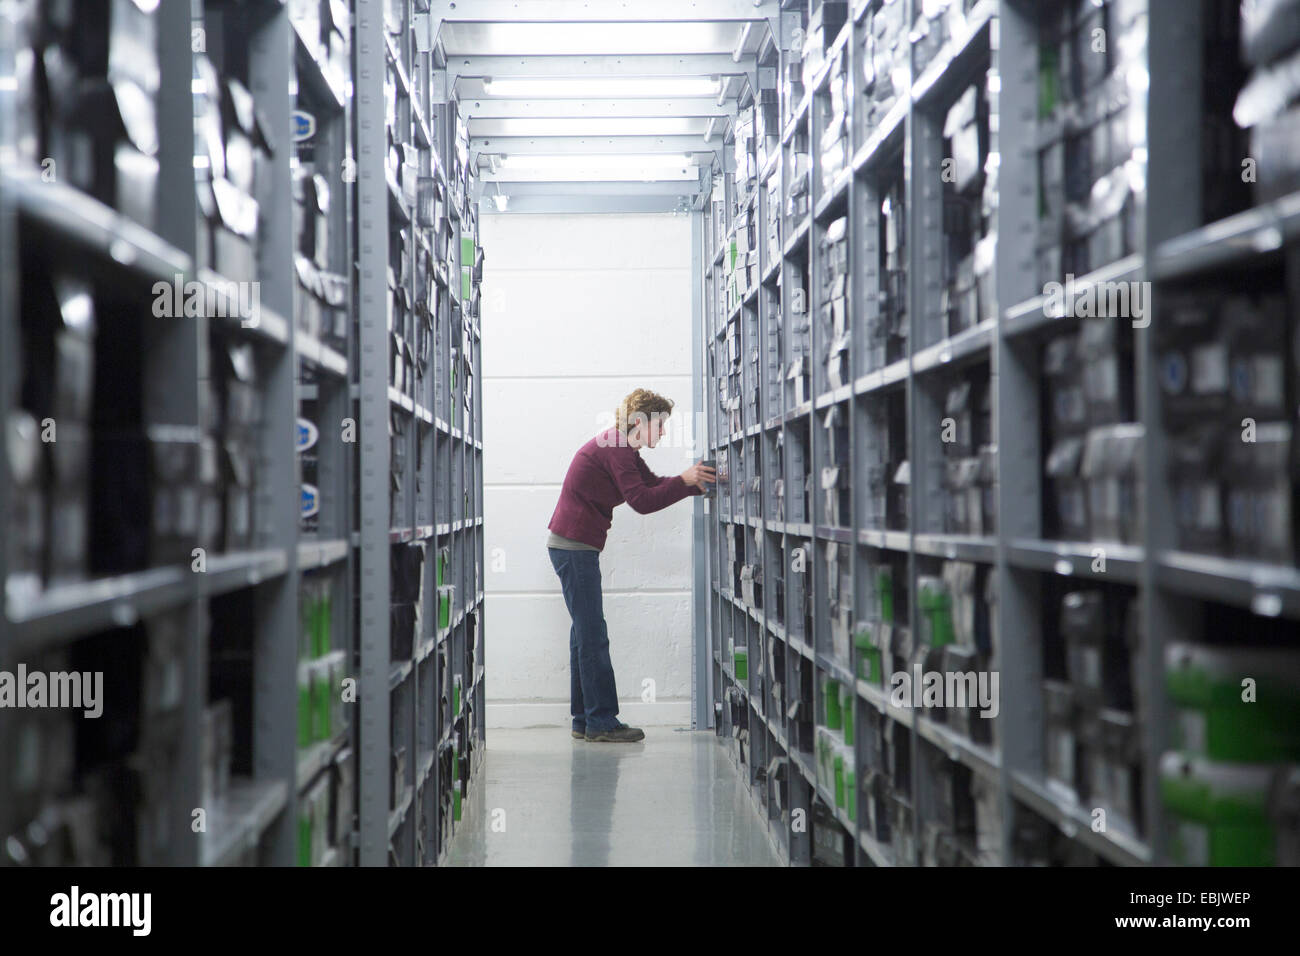 Trabajador buscando existencias en almacén Healthcare Imagen De Stock